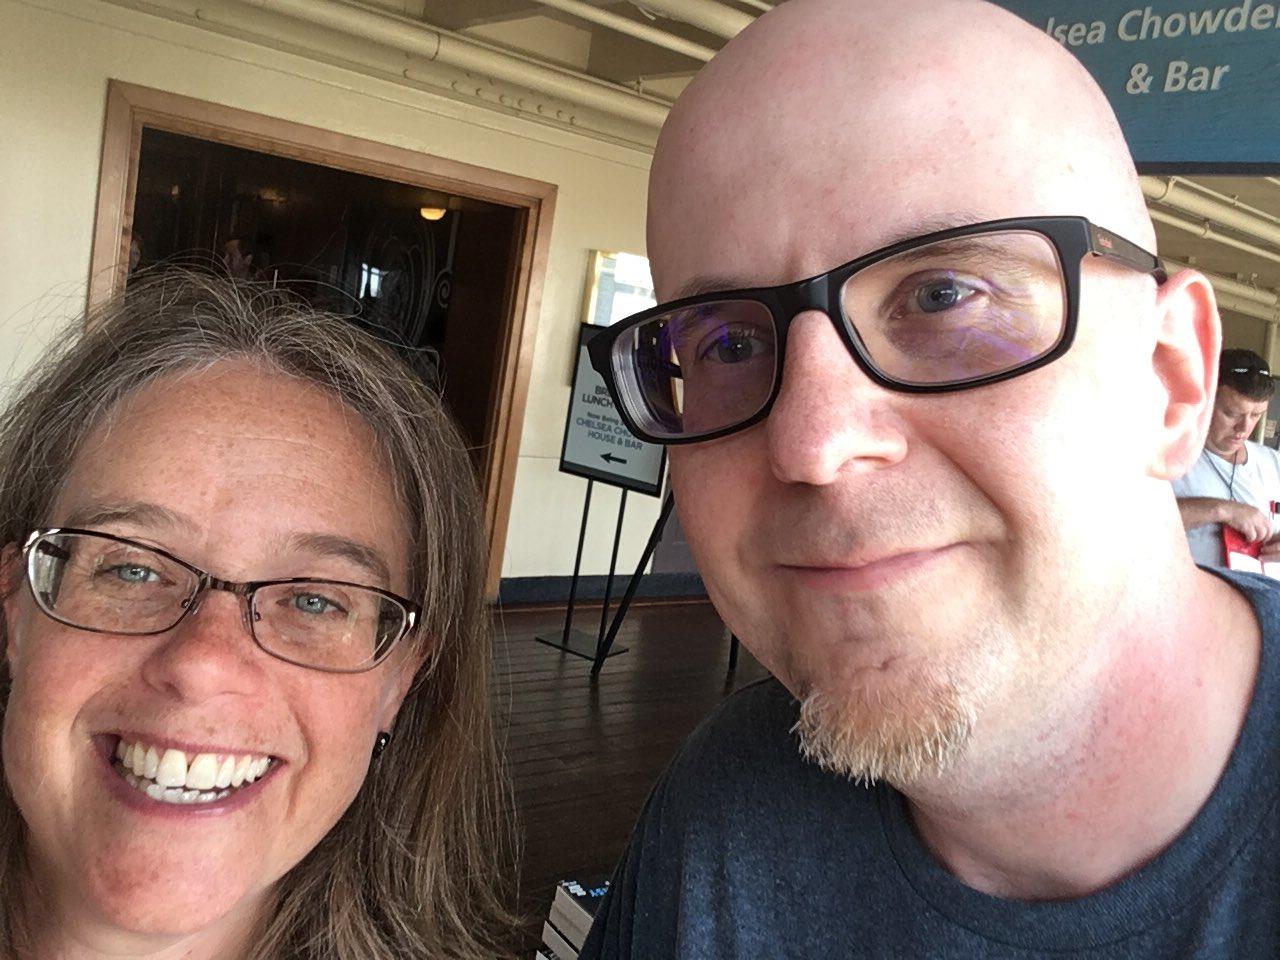 #StokerCon2017 selfies with @JohnJosephAdams https://t.co/HGCS253lnK